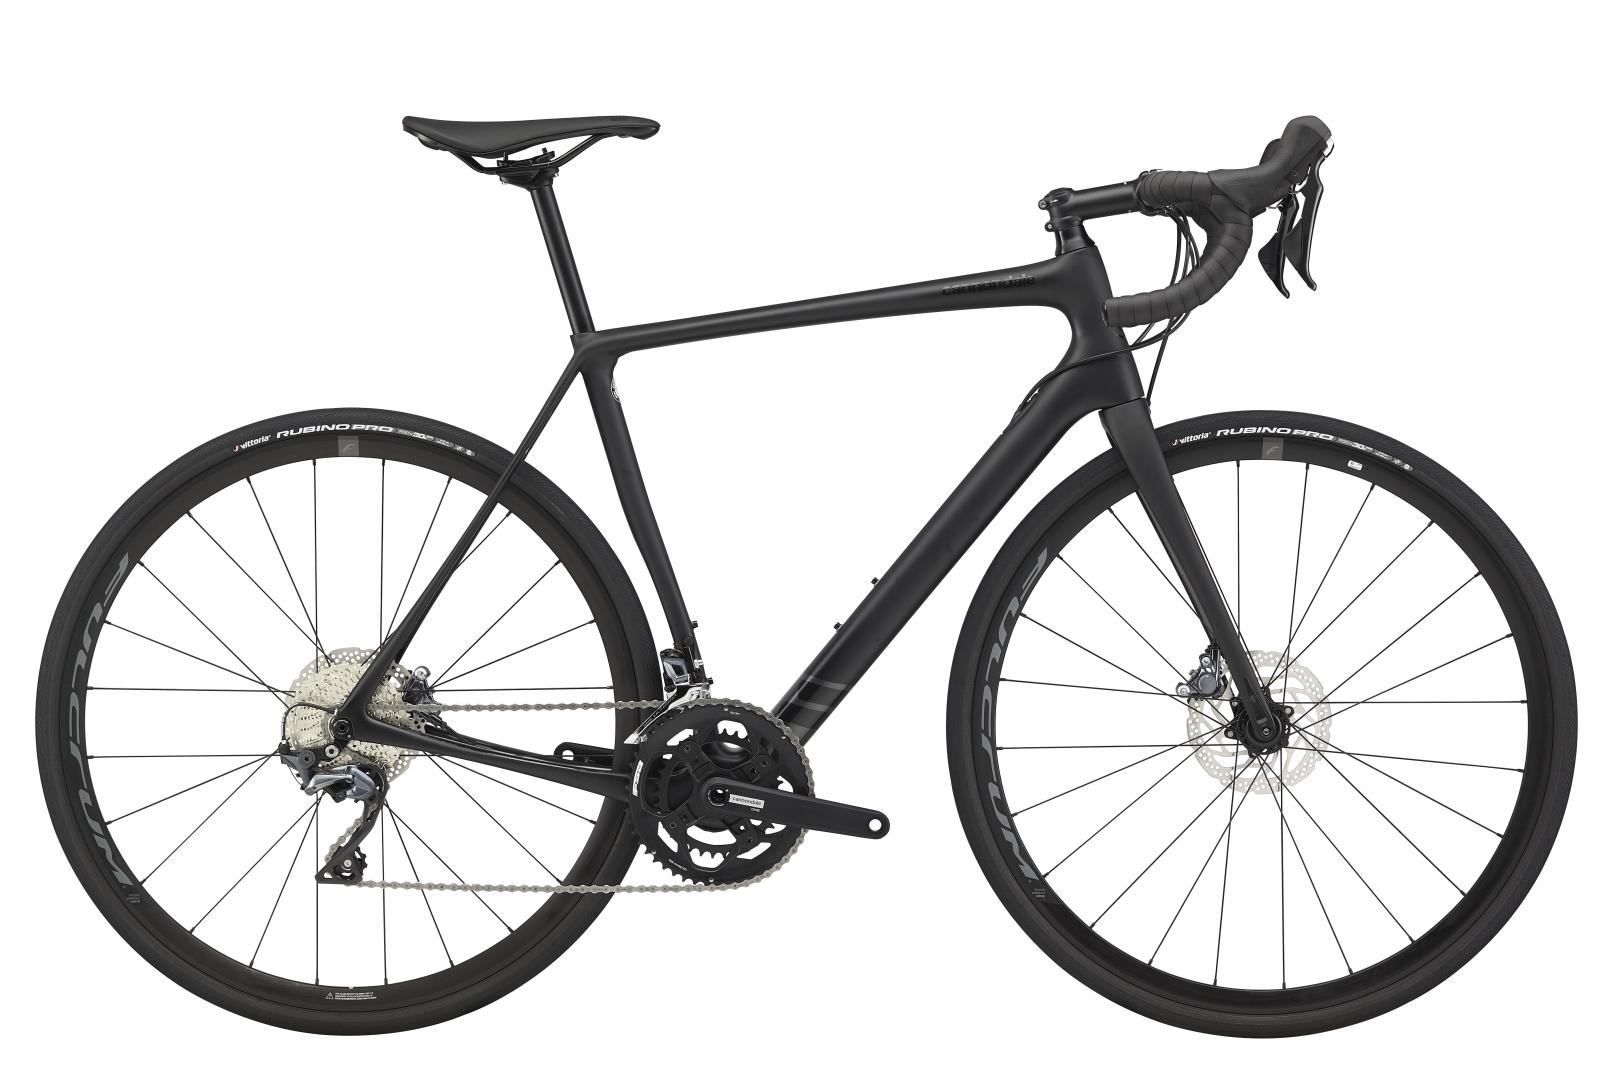 Cannondale Synapse Carbon Ultegra országúti kerékpár - szürke - 54 cm (2020)